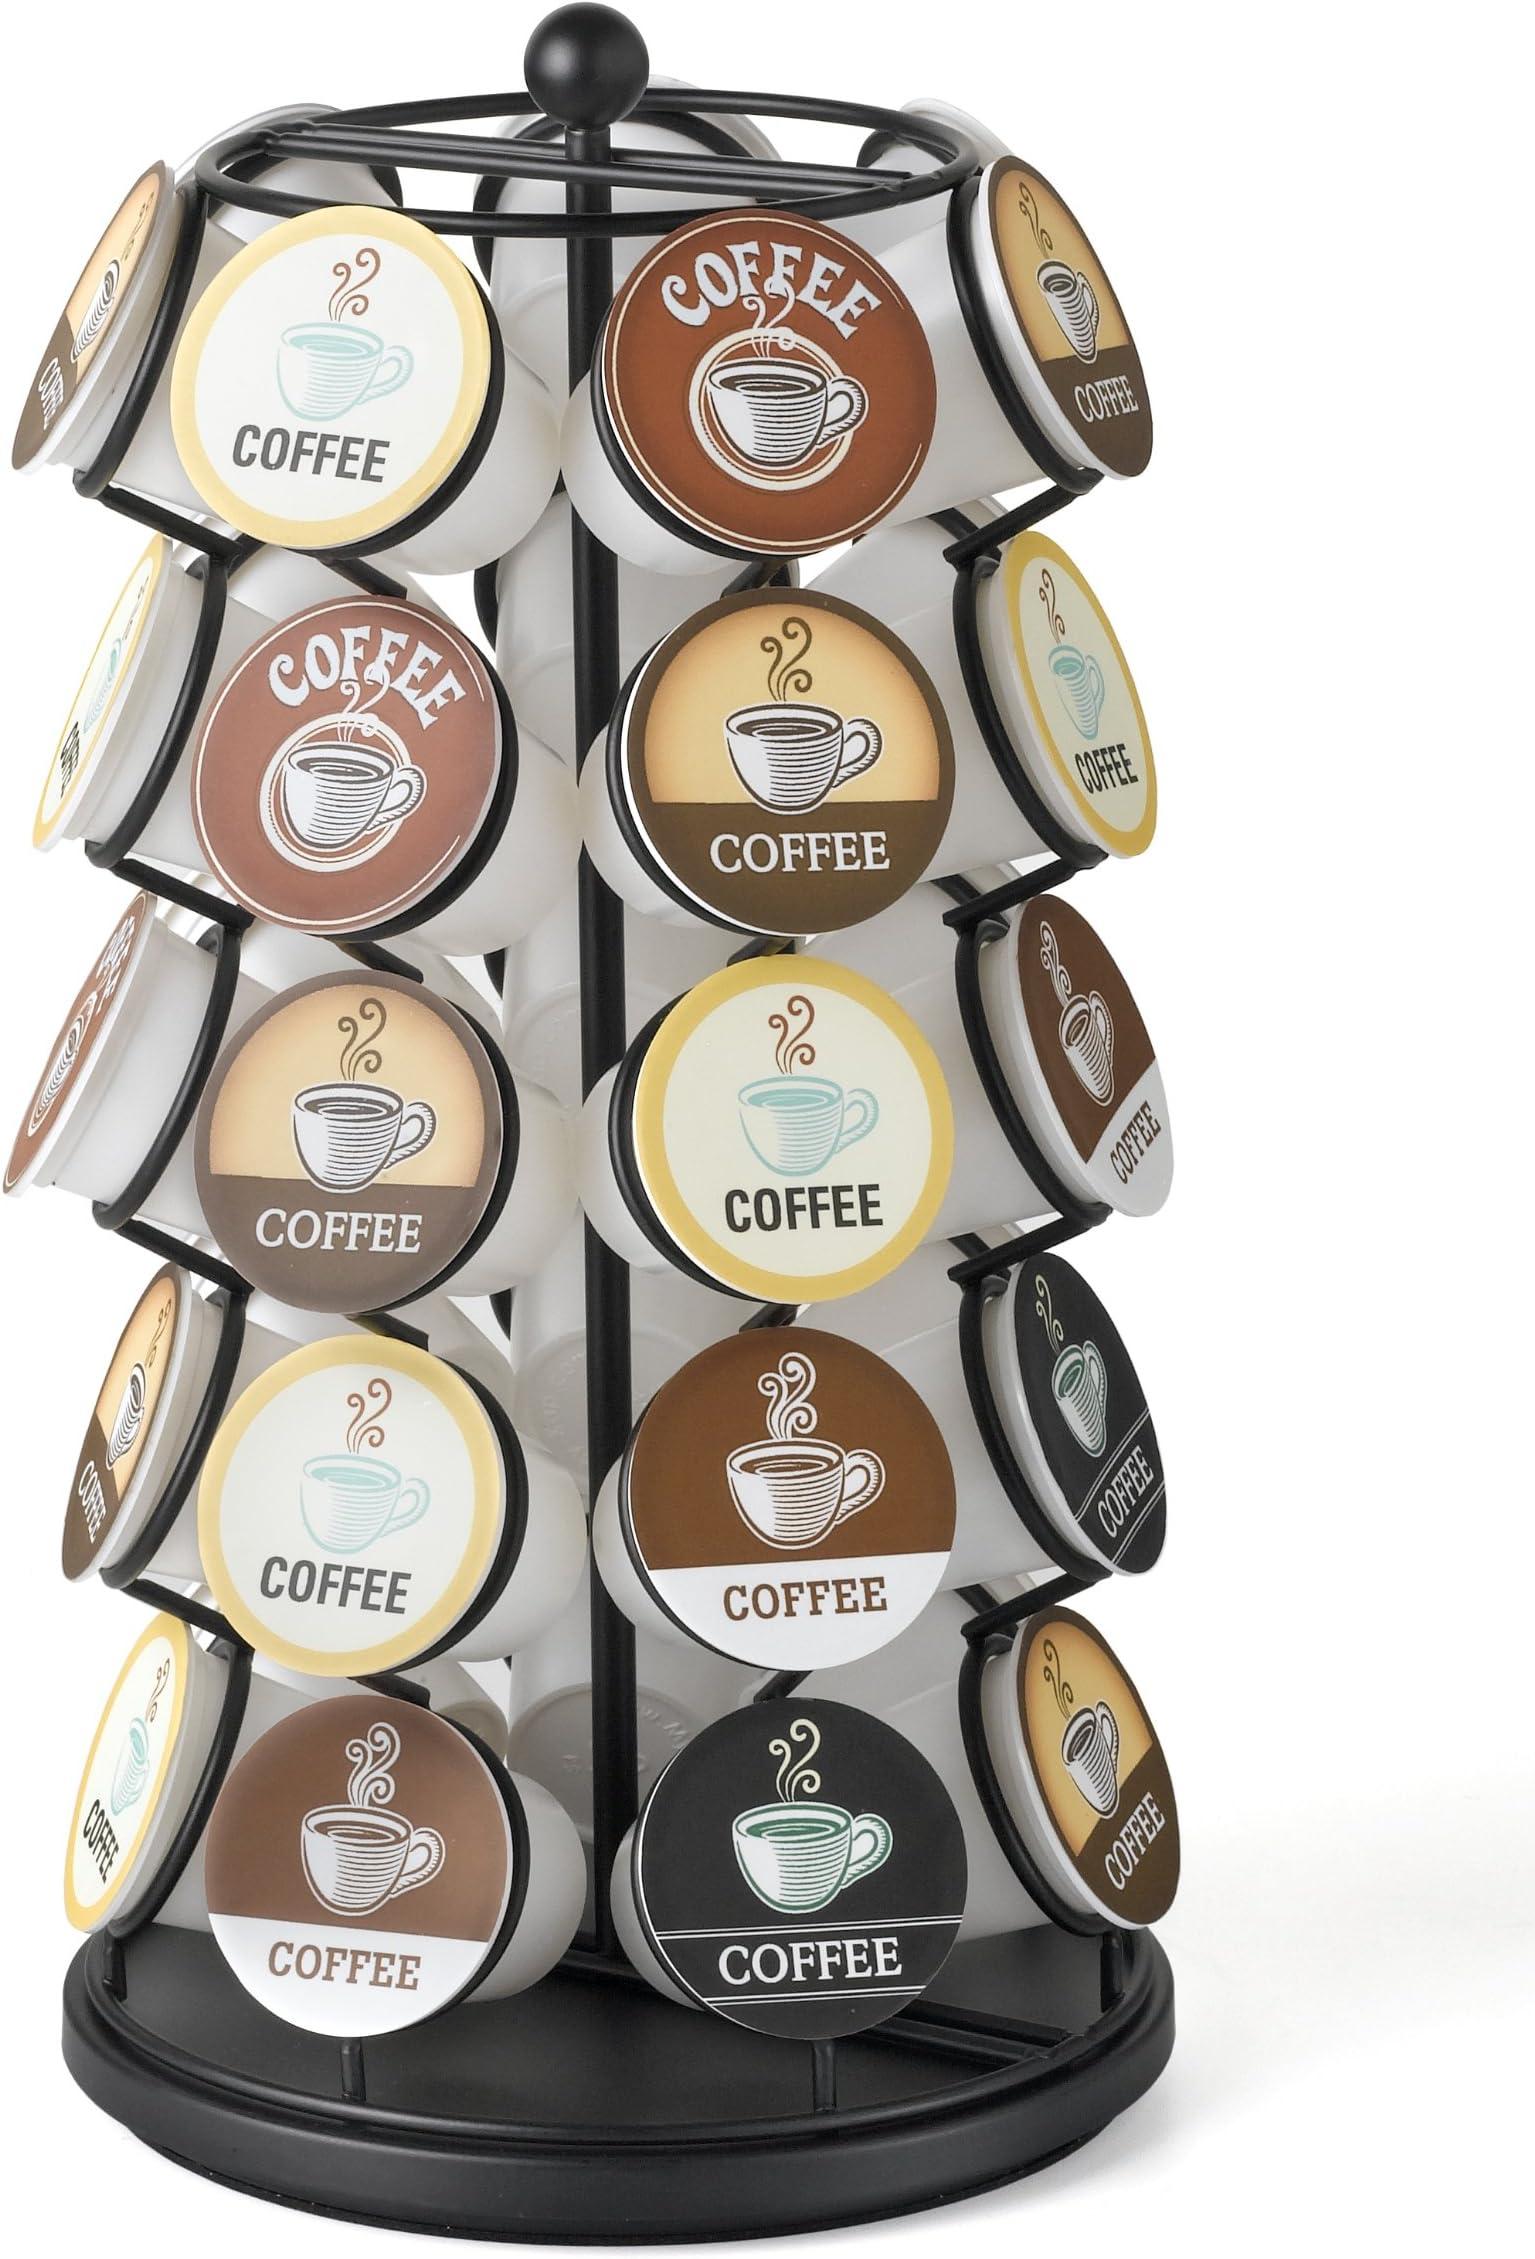 coffee pod holders amazon com rh amazon com